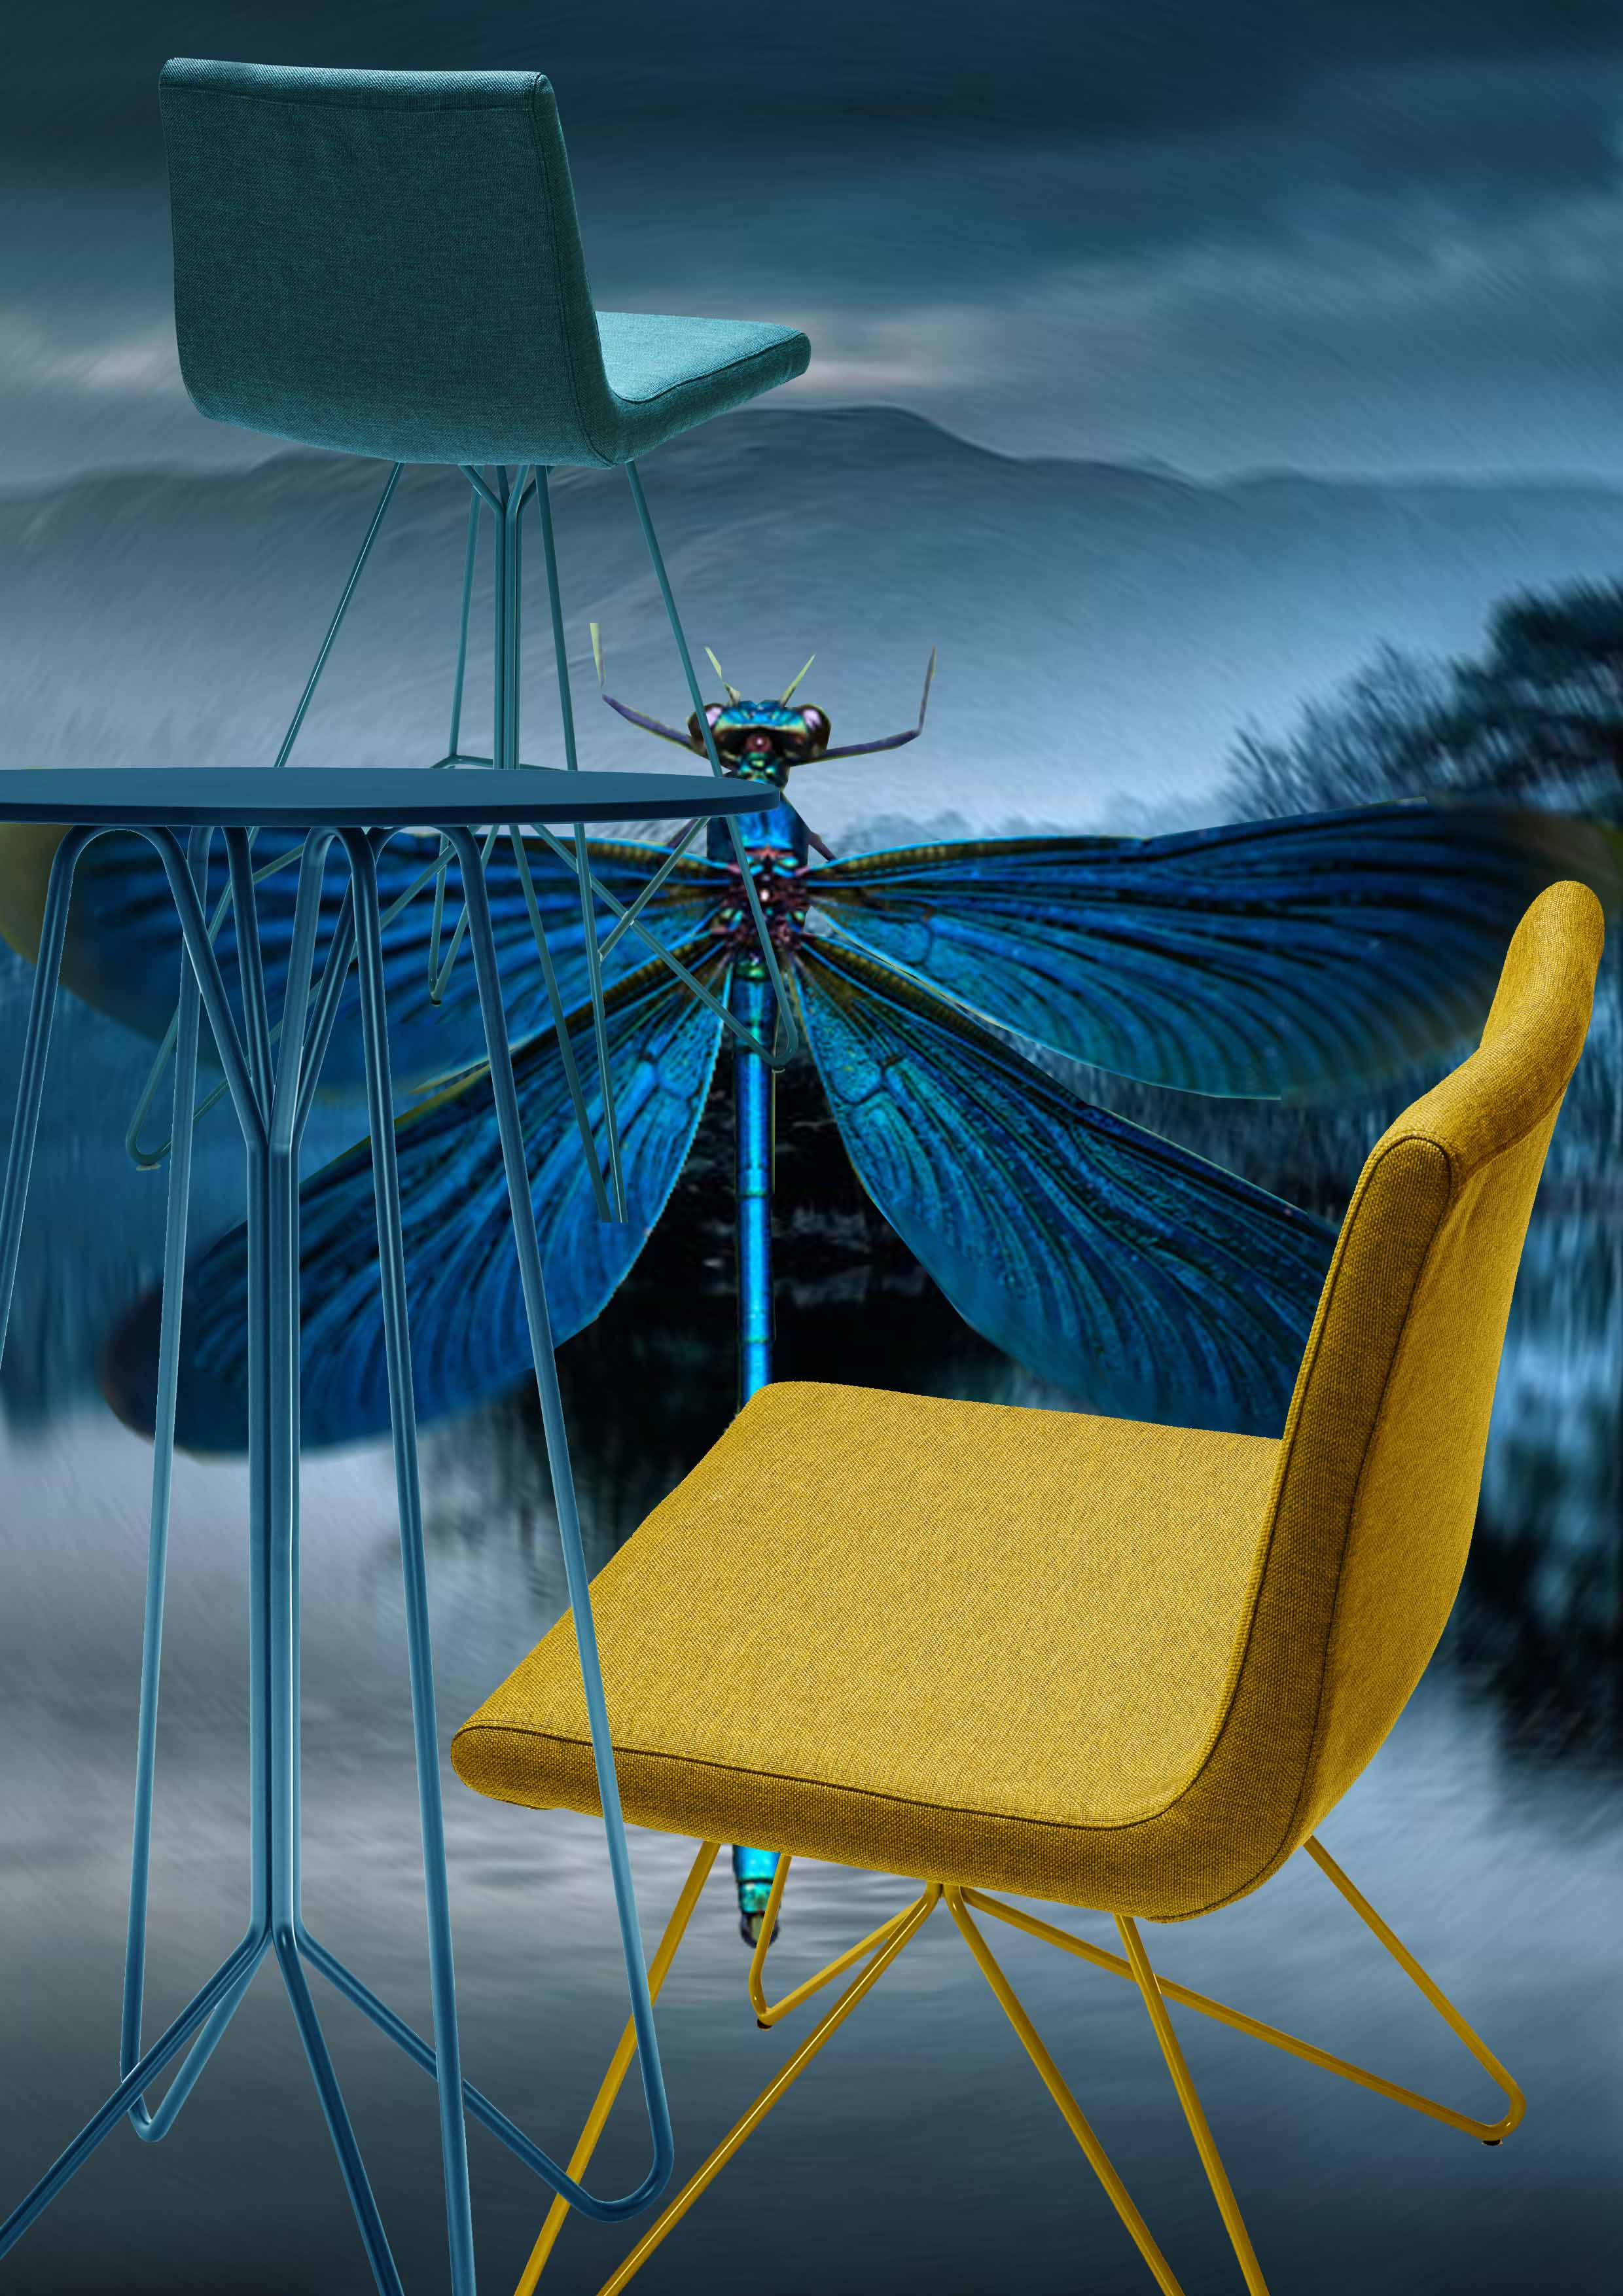 dragon fly, libelula,claire davies design